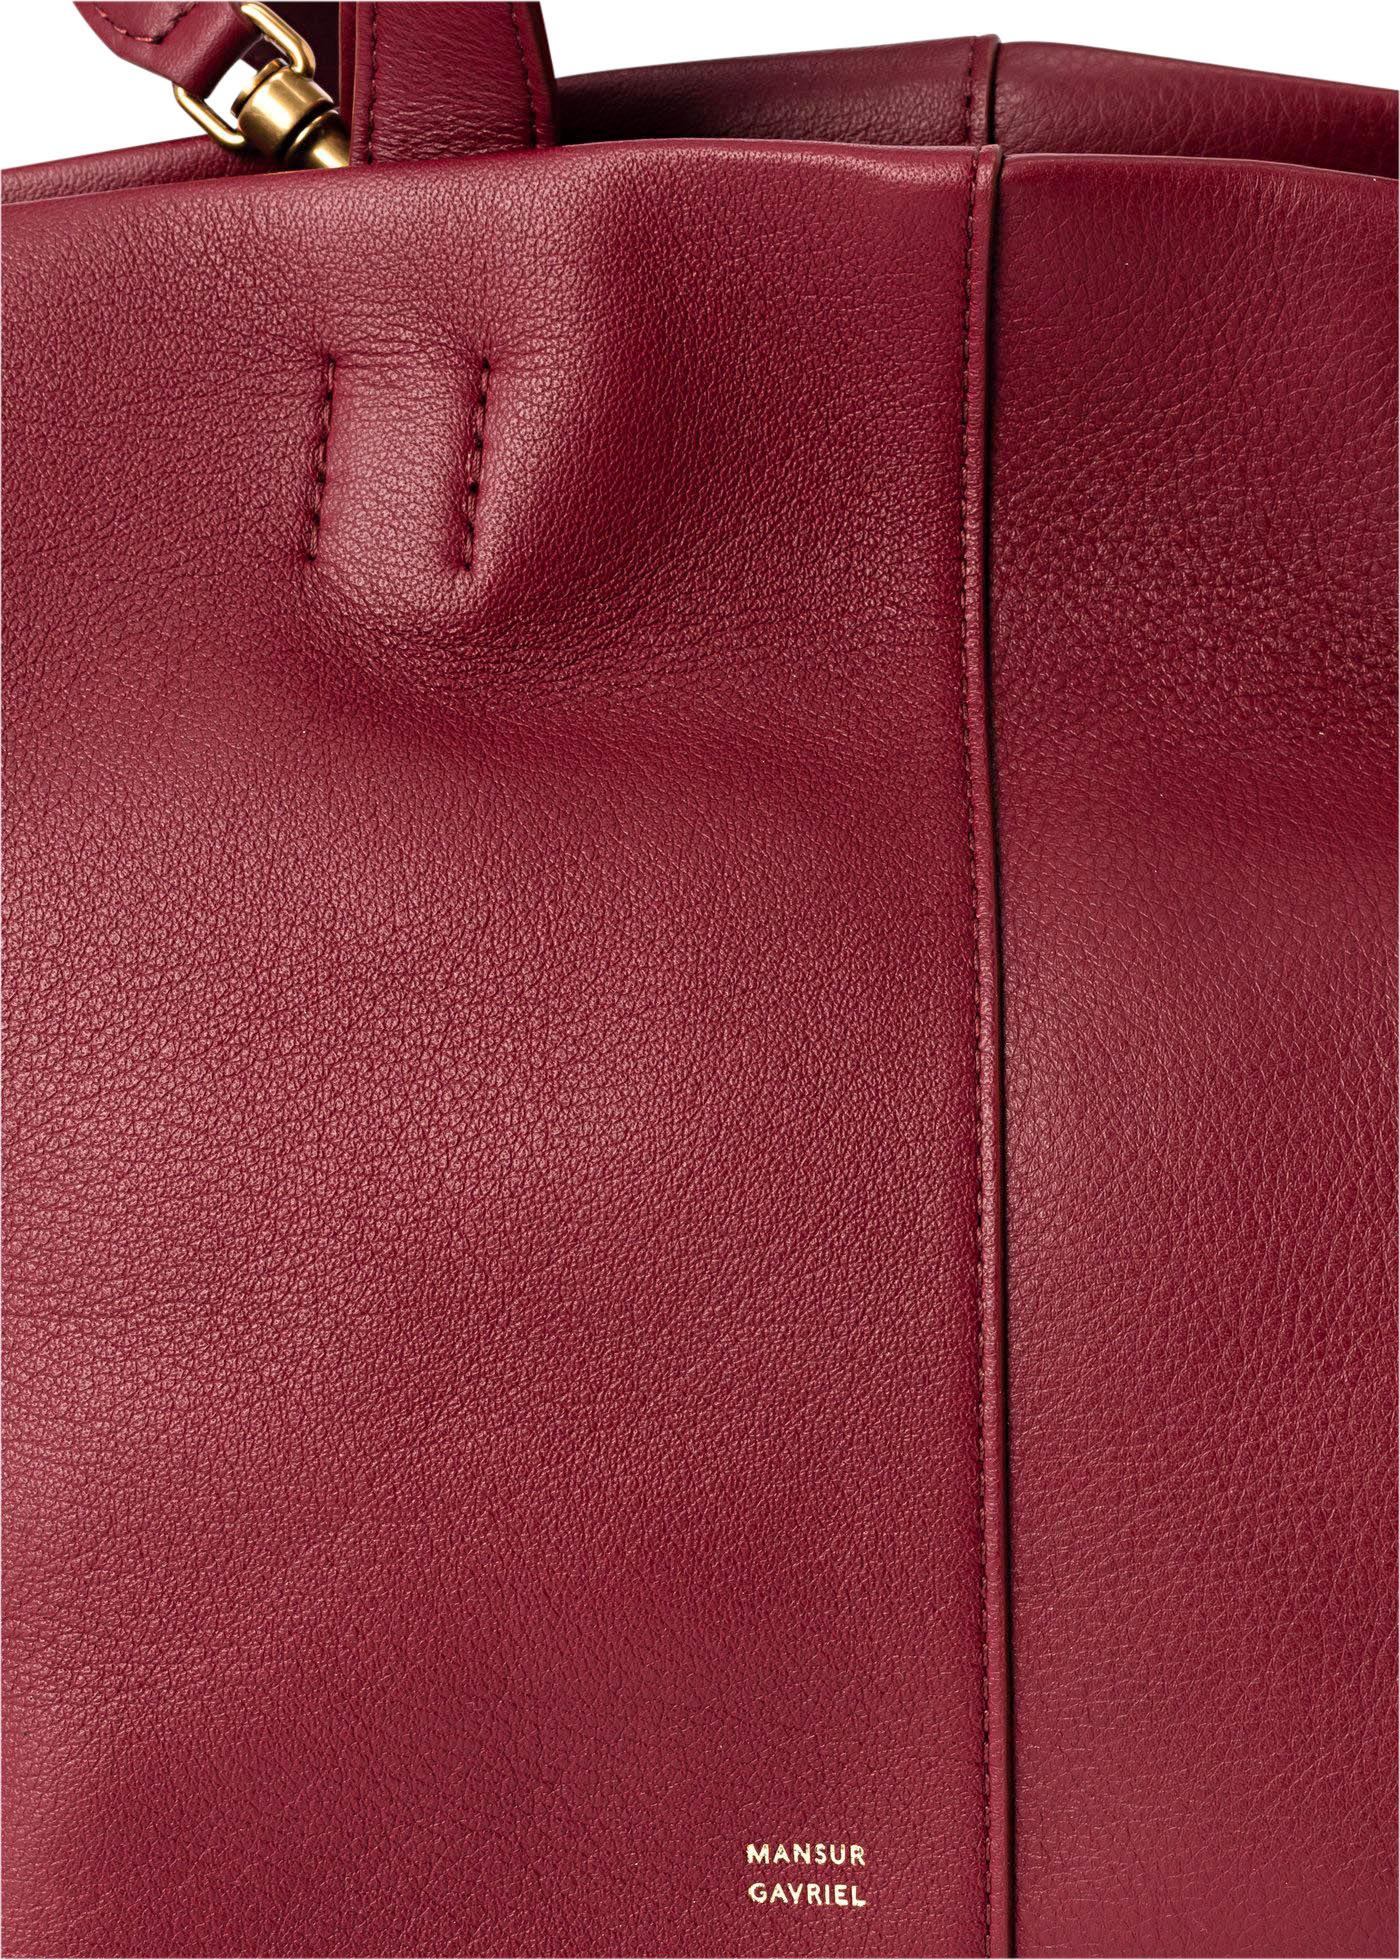 Tulipano Bag image number 2